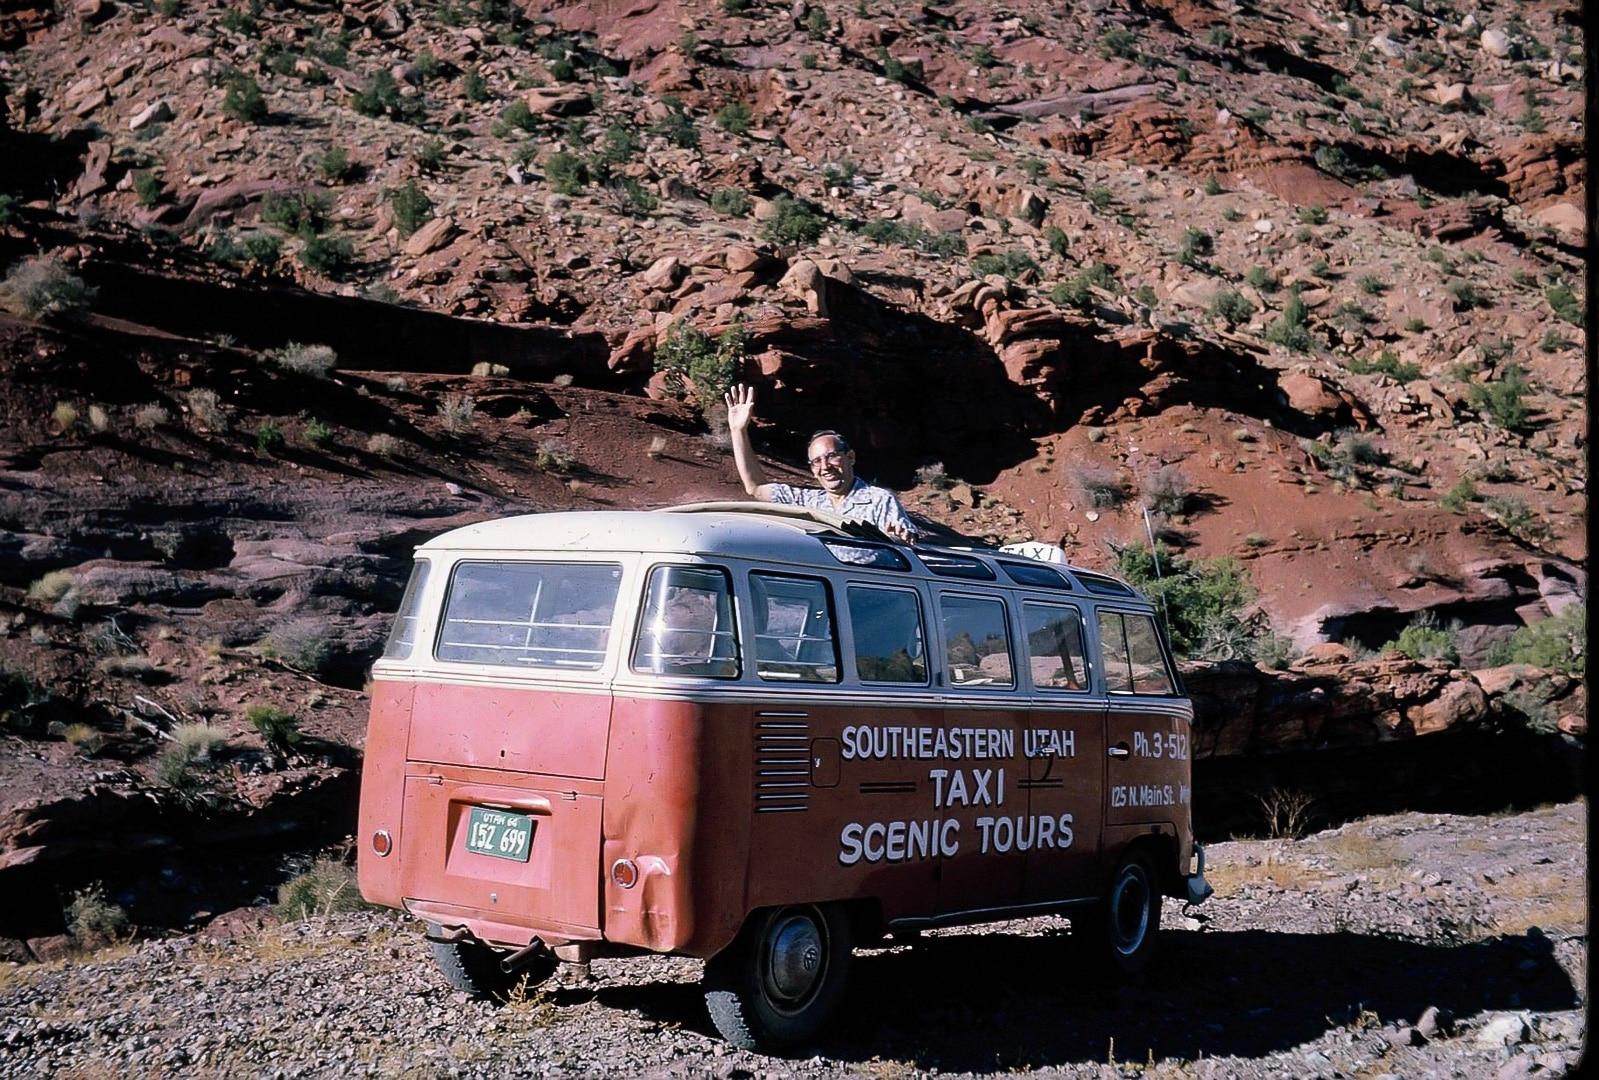 Lin Ottinger Canyon Land Scenic Tour VW Bus - BeCombi - Une-10